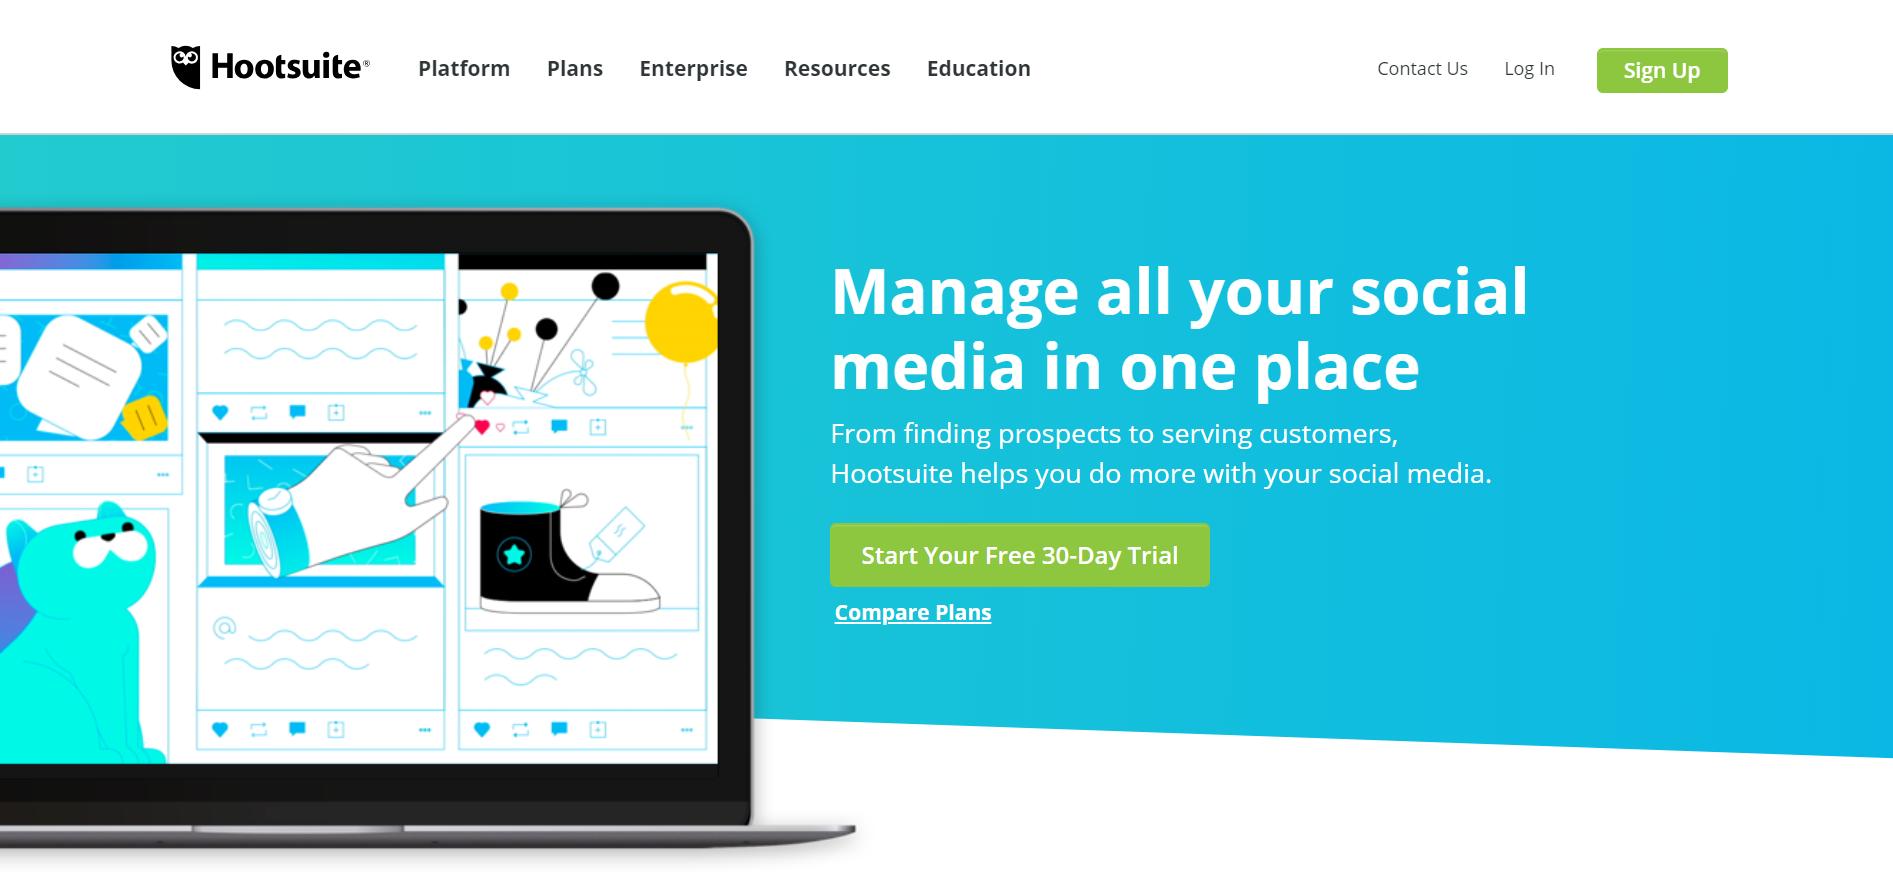 Top 6 phần mềm quản lý fanpage tốt nhất – DooPage